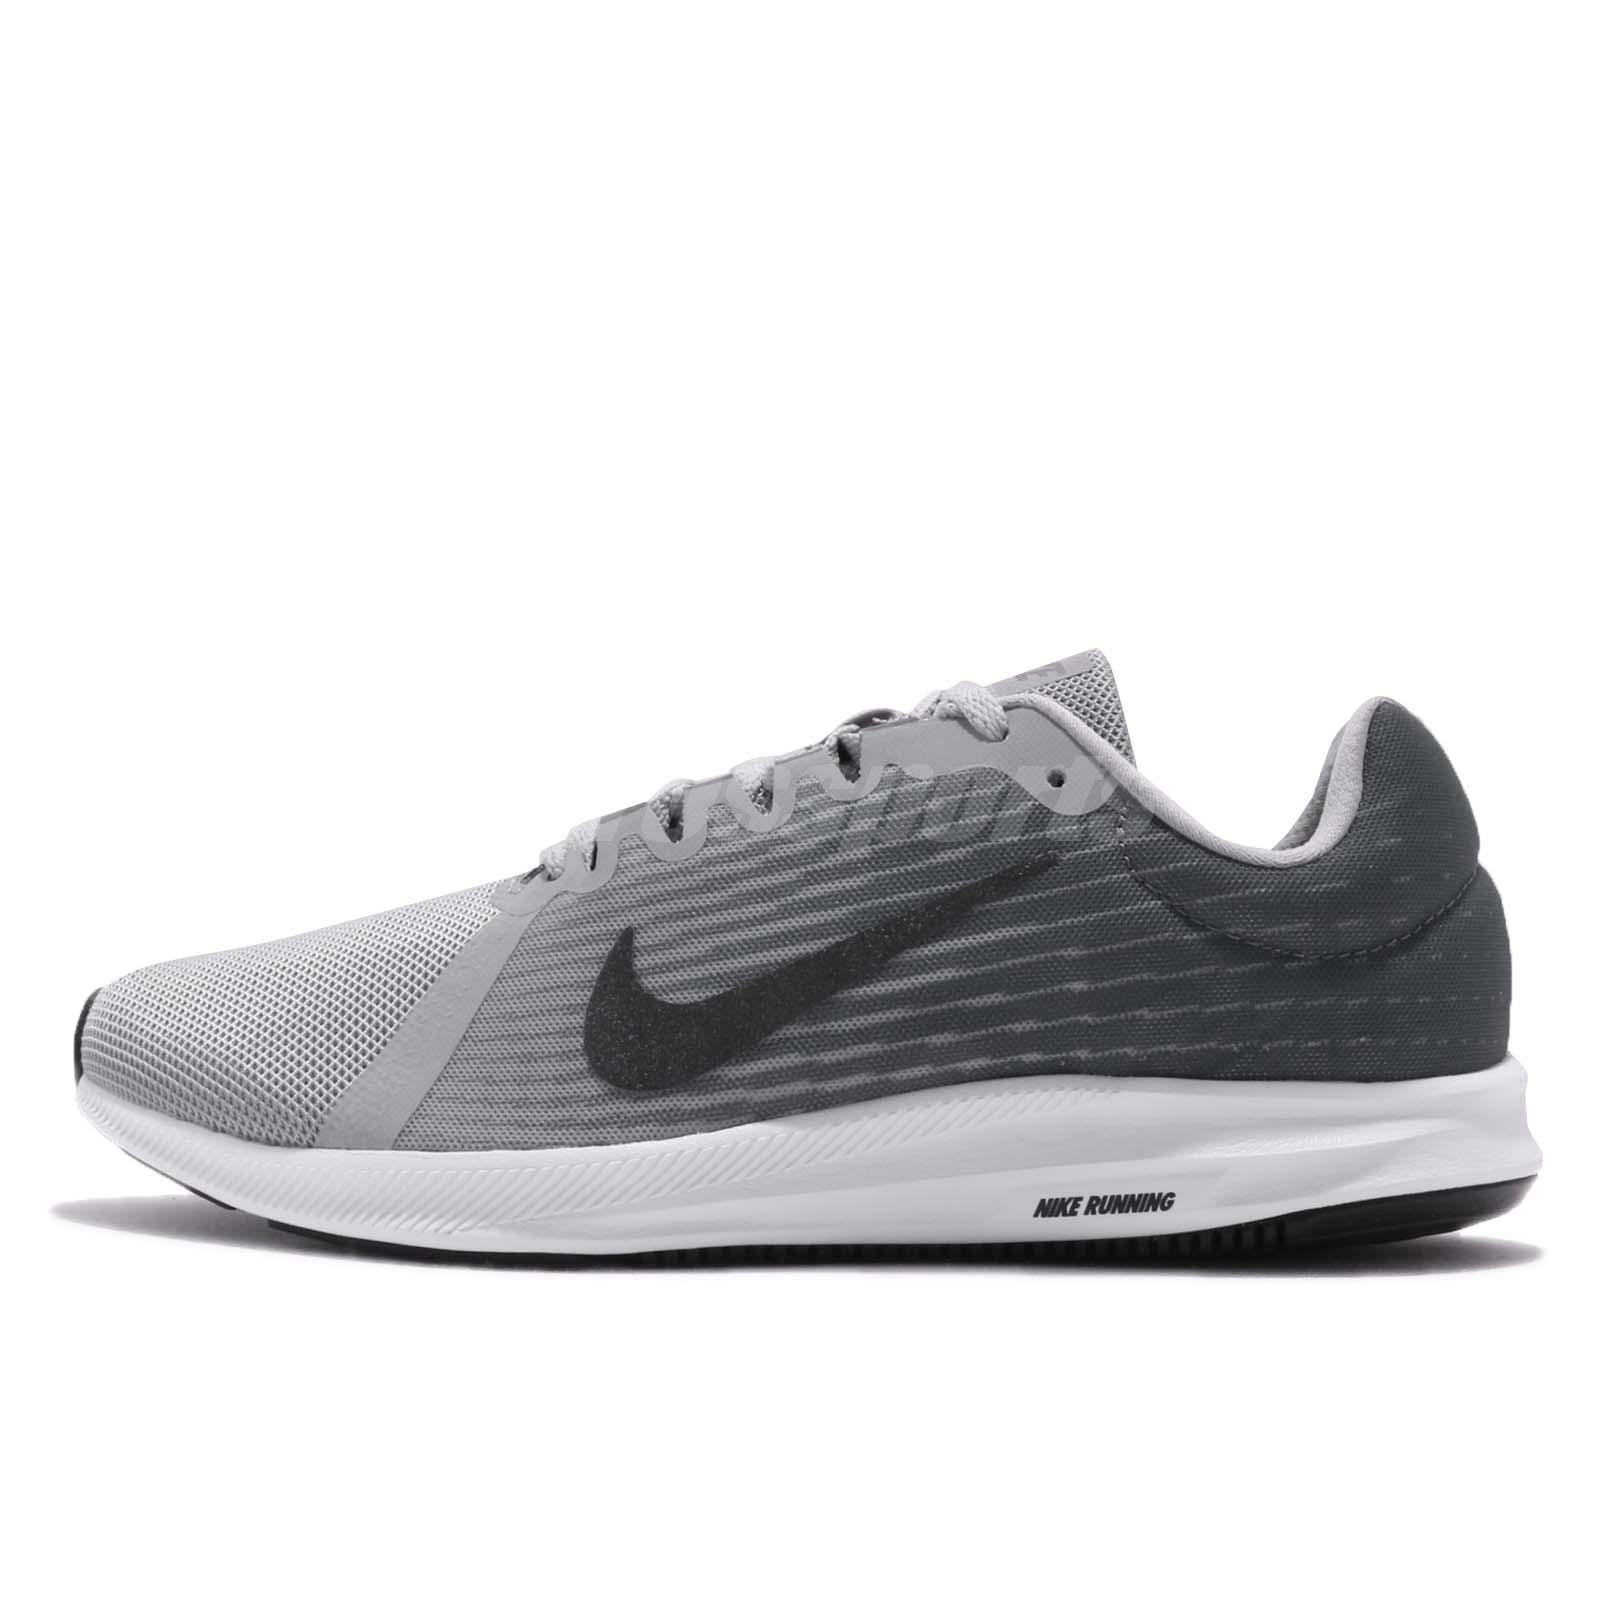 Nike DownShifter 8 VIII esecuzione Metallic Dark grigio Uomo In esecuzione VIII scarpe   9f13be